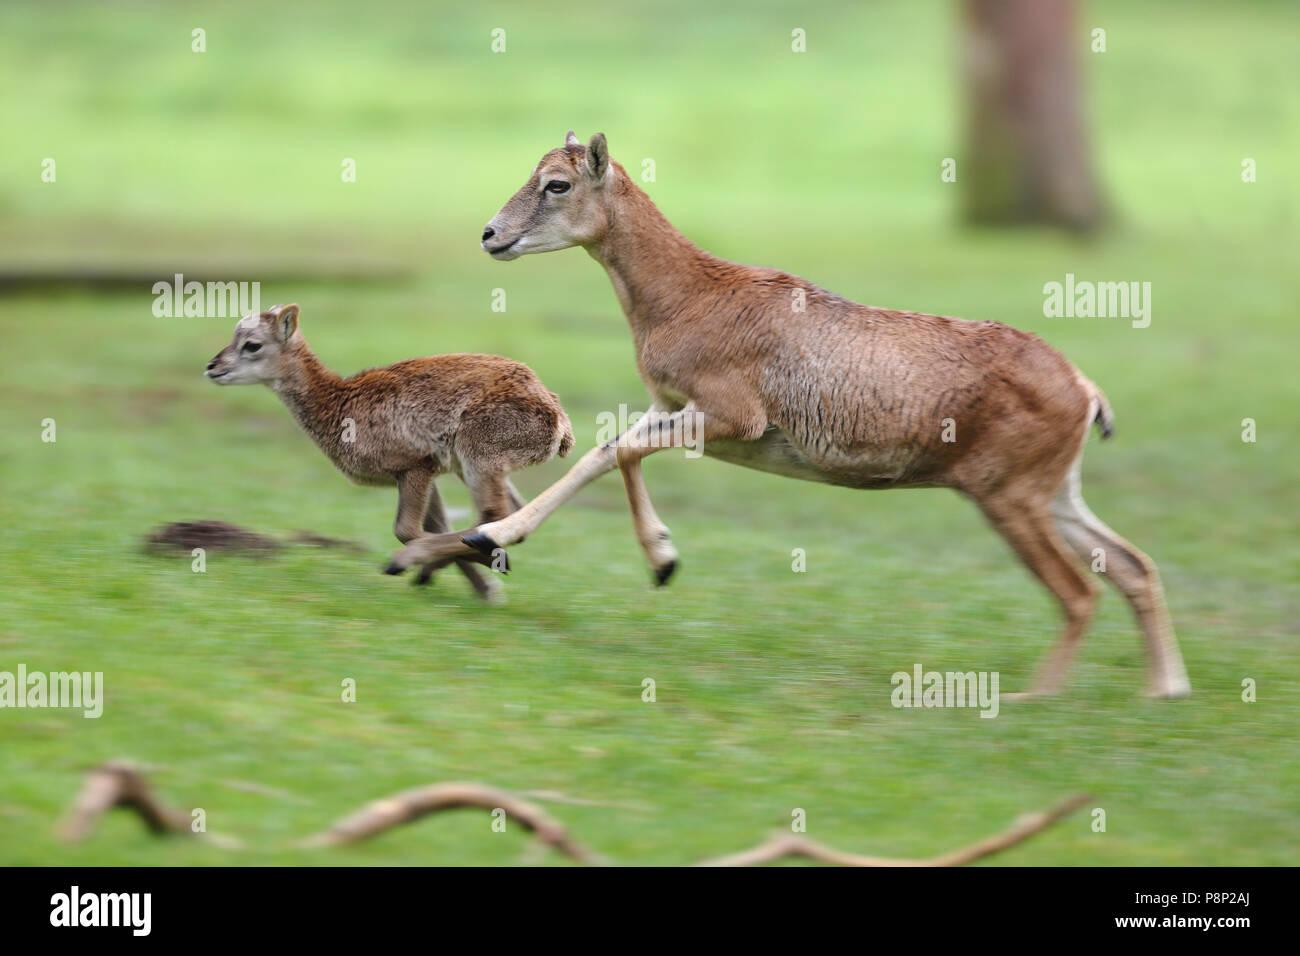 Mouflon ewe running with her young lamb. - Stock Image